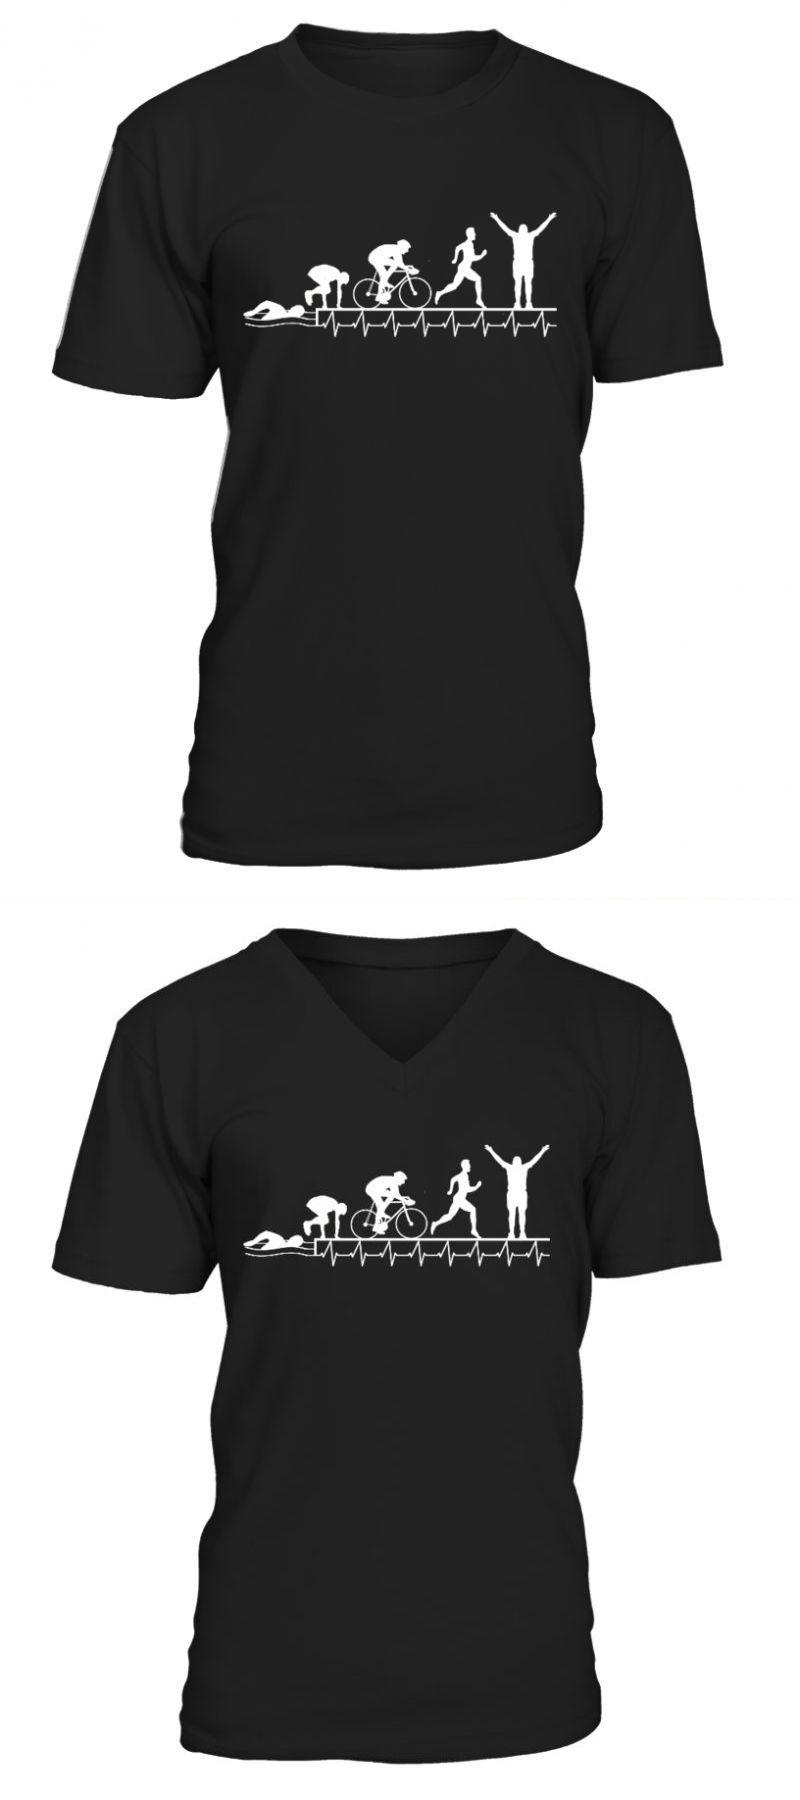 74d435aa7 Karrimor running t shirt ladies triathlon heartbeat 1 tee shirt running  vegan #karrimor #running